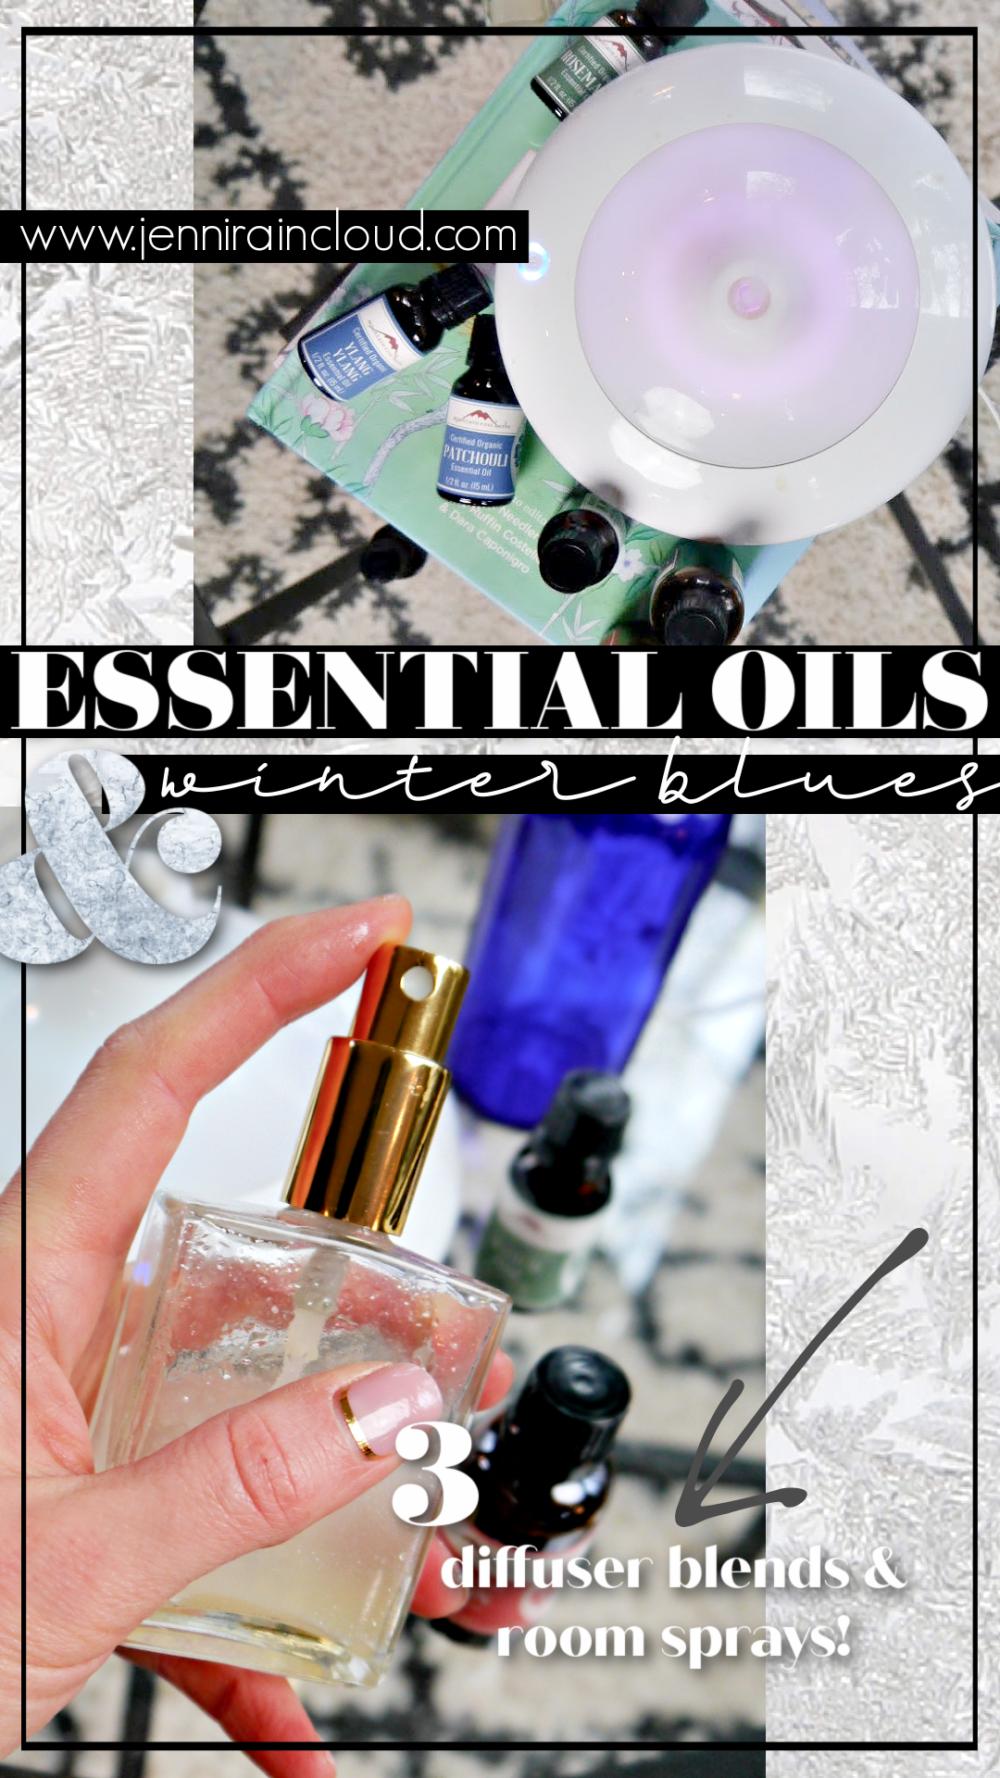 Winter Blues & Essential Oil Blends